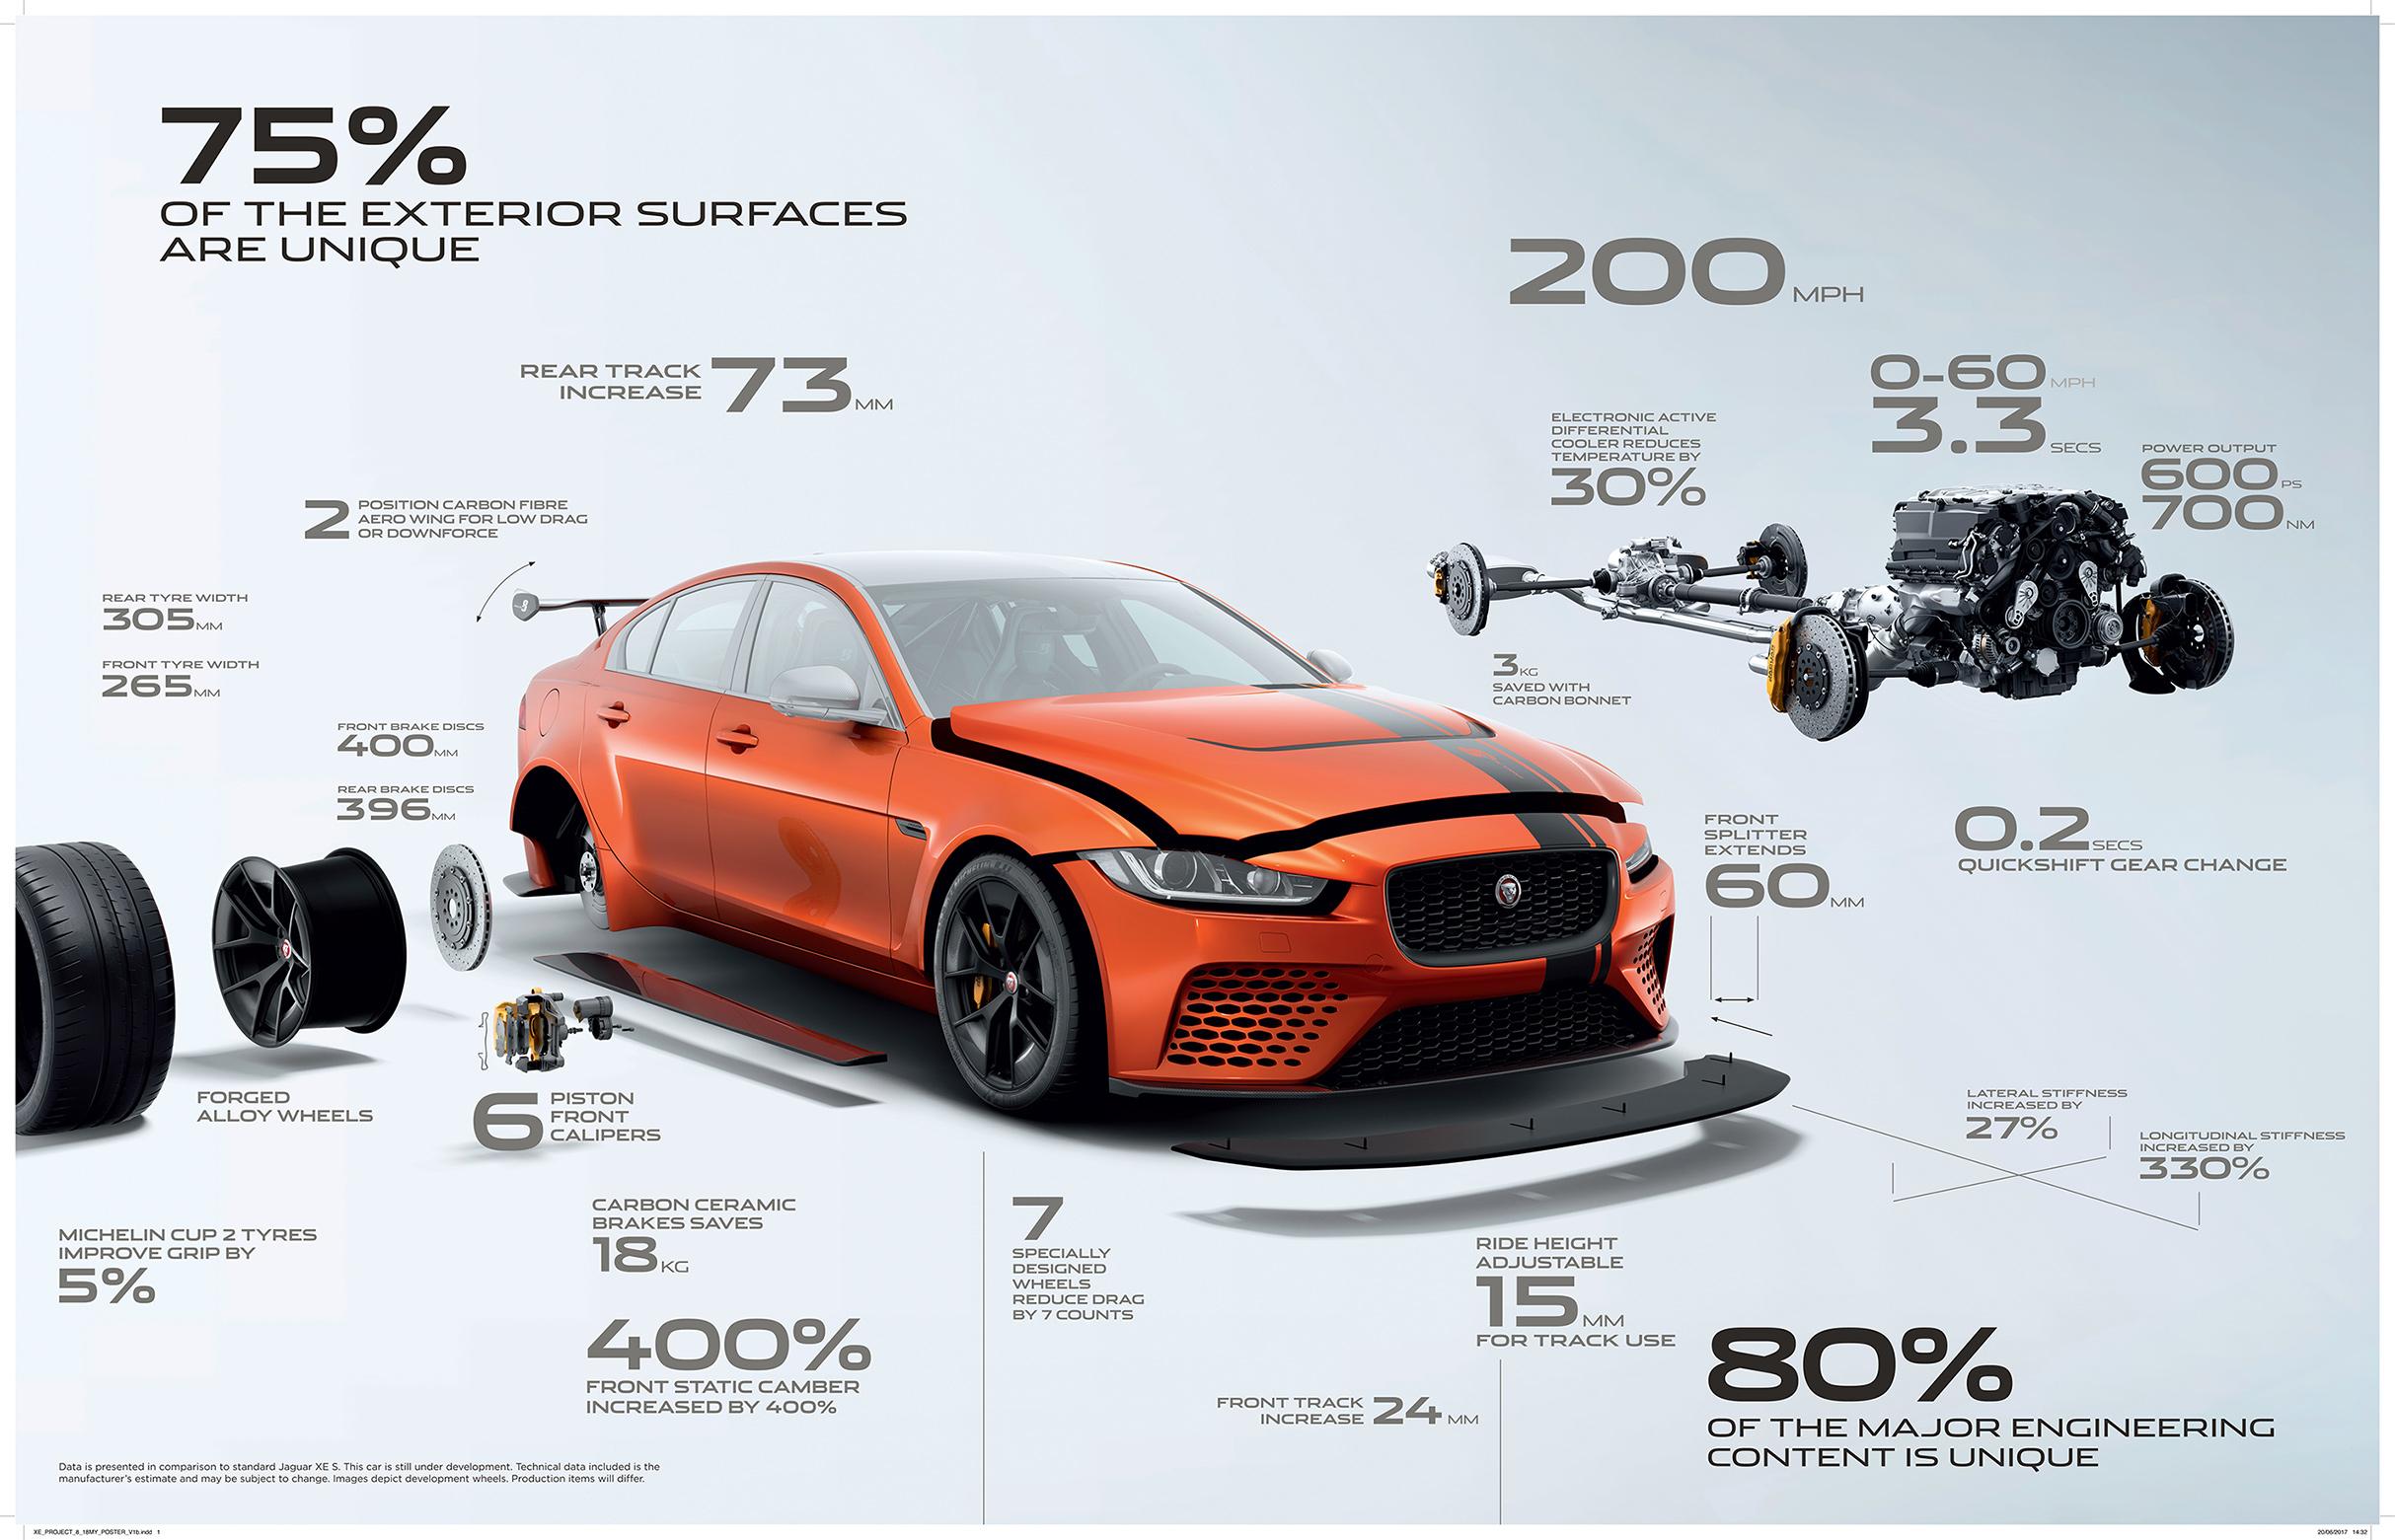 TrackWorthy - Jaguar XE SV Project 8 (5)